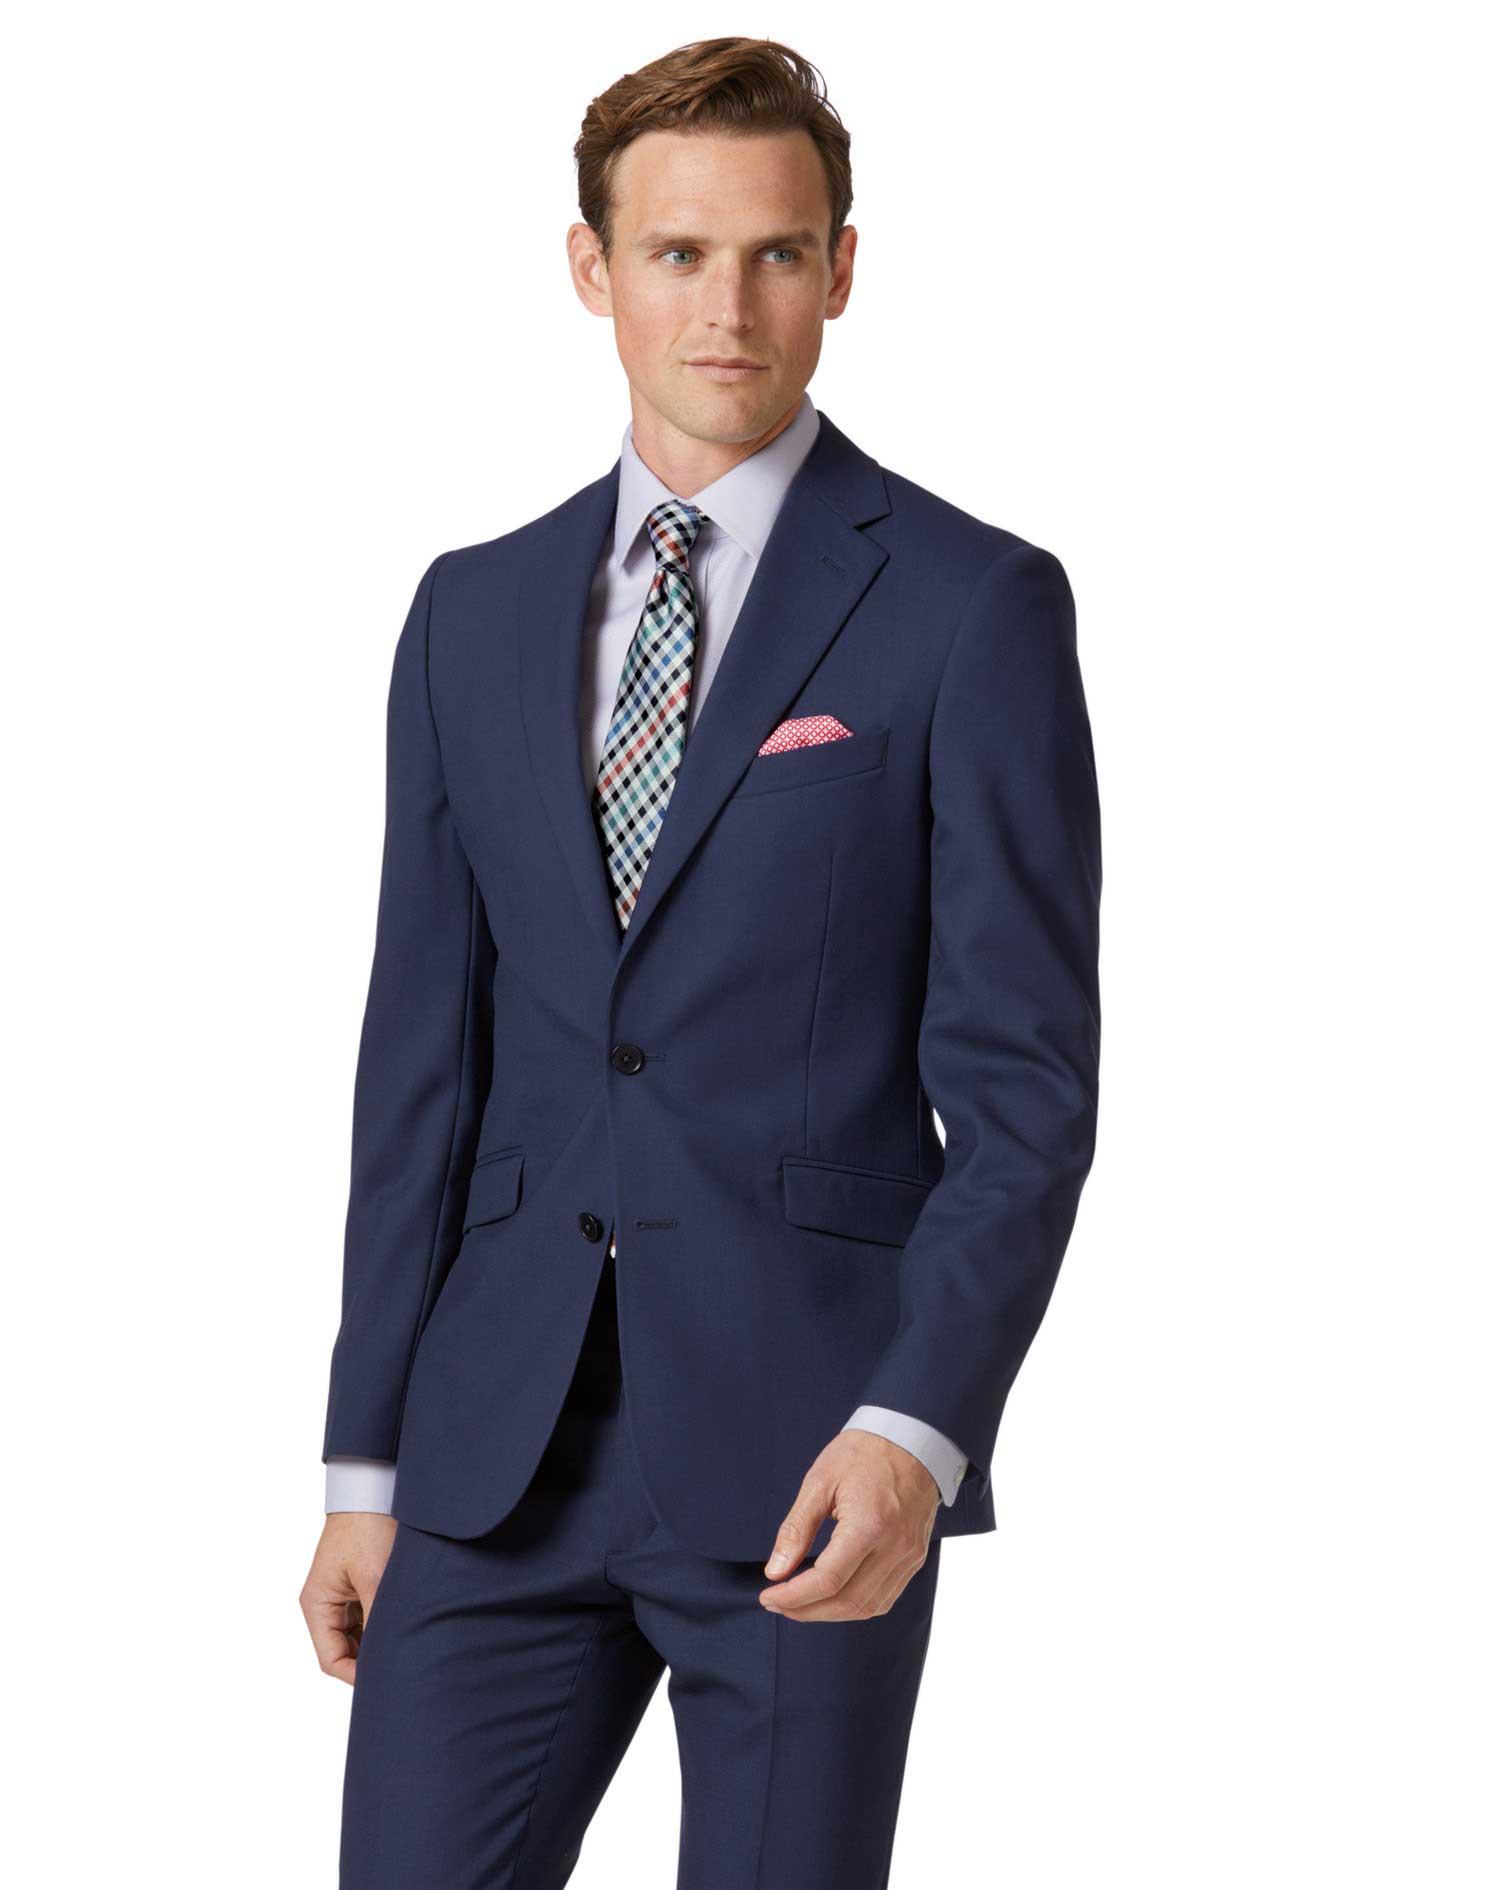 Royal Blue Extra Slim Fit Merino Business Suit Wool Jacket Size 42 Regular by Charles Tyrwhitt